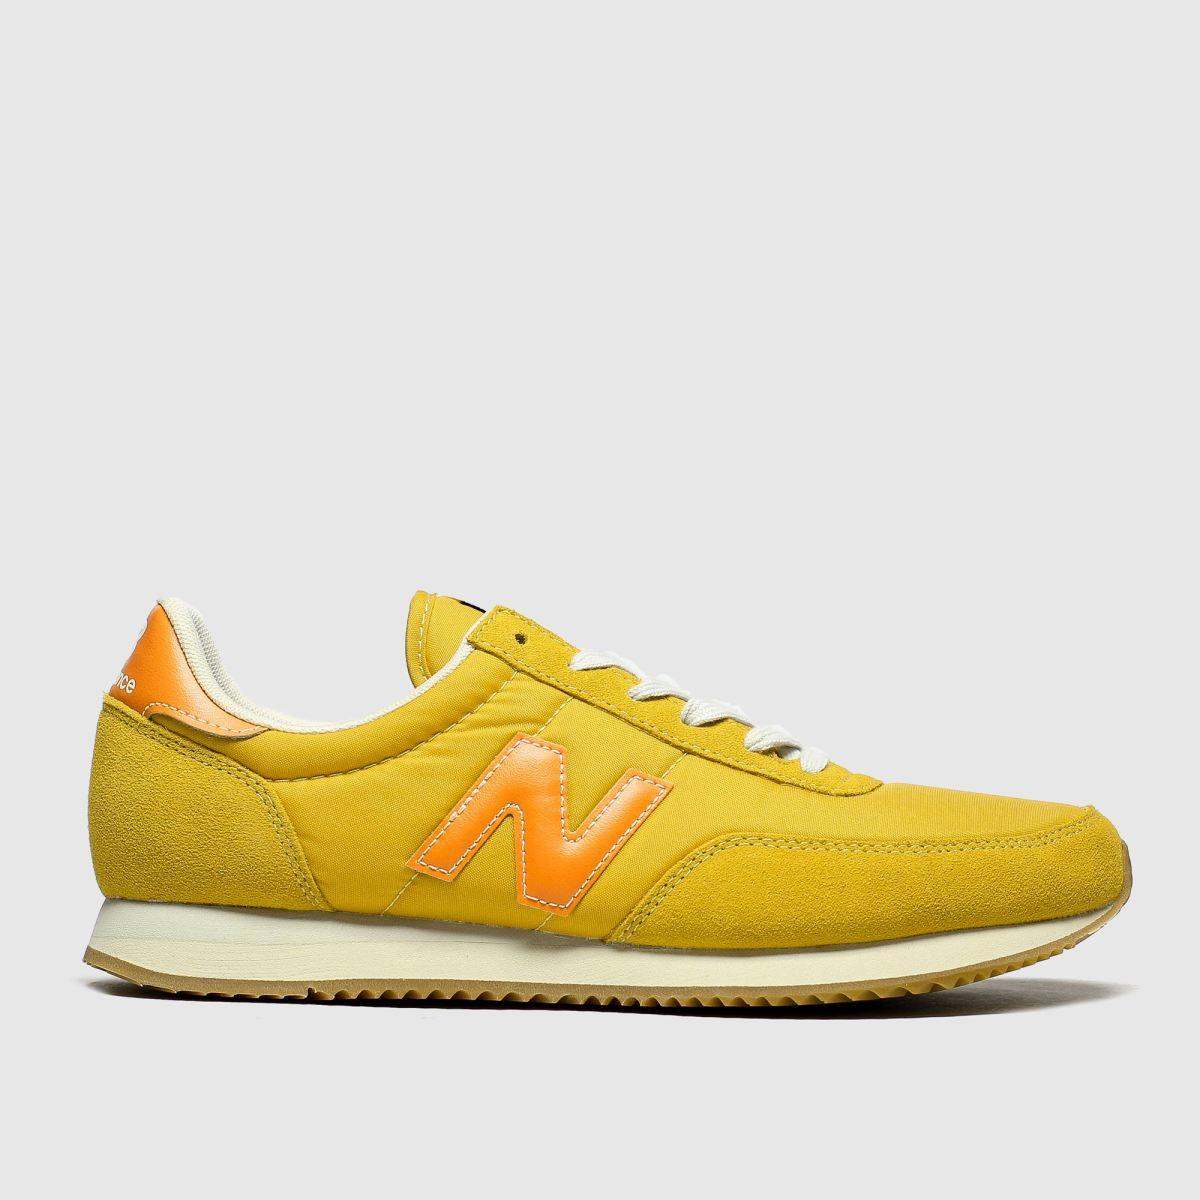 New Balance New Balance Yellow 720 V1 Trainers